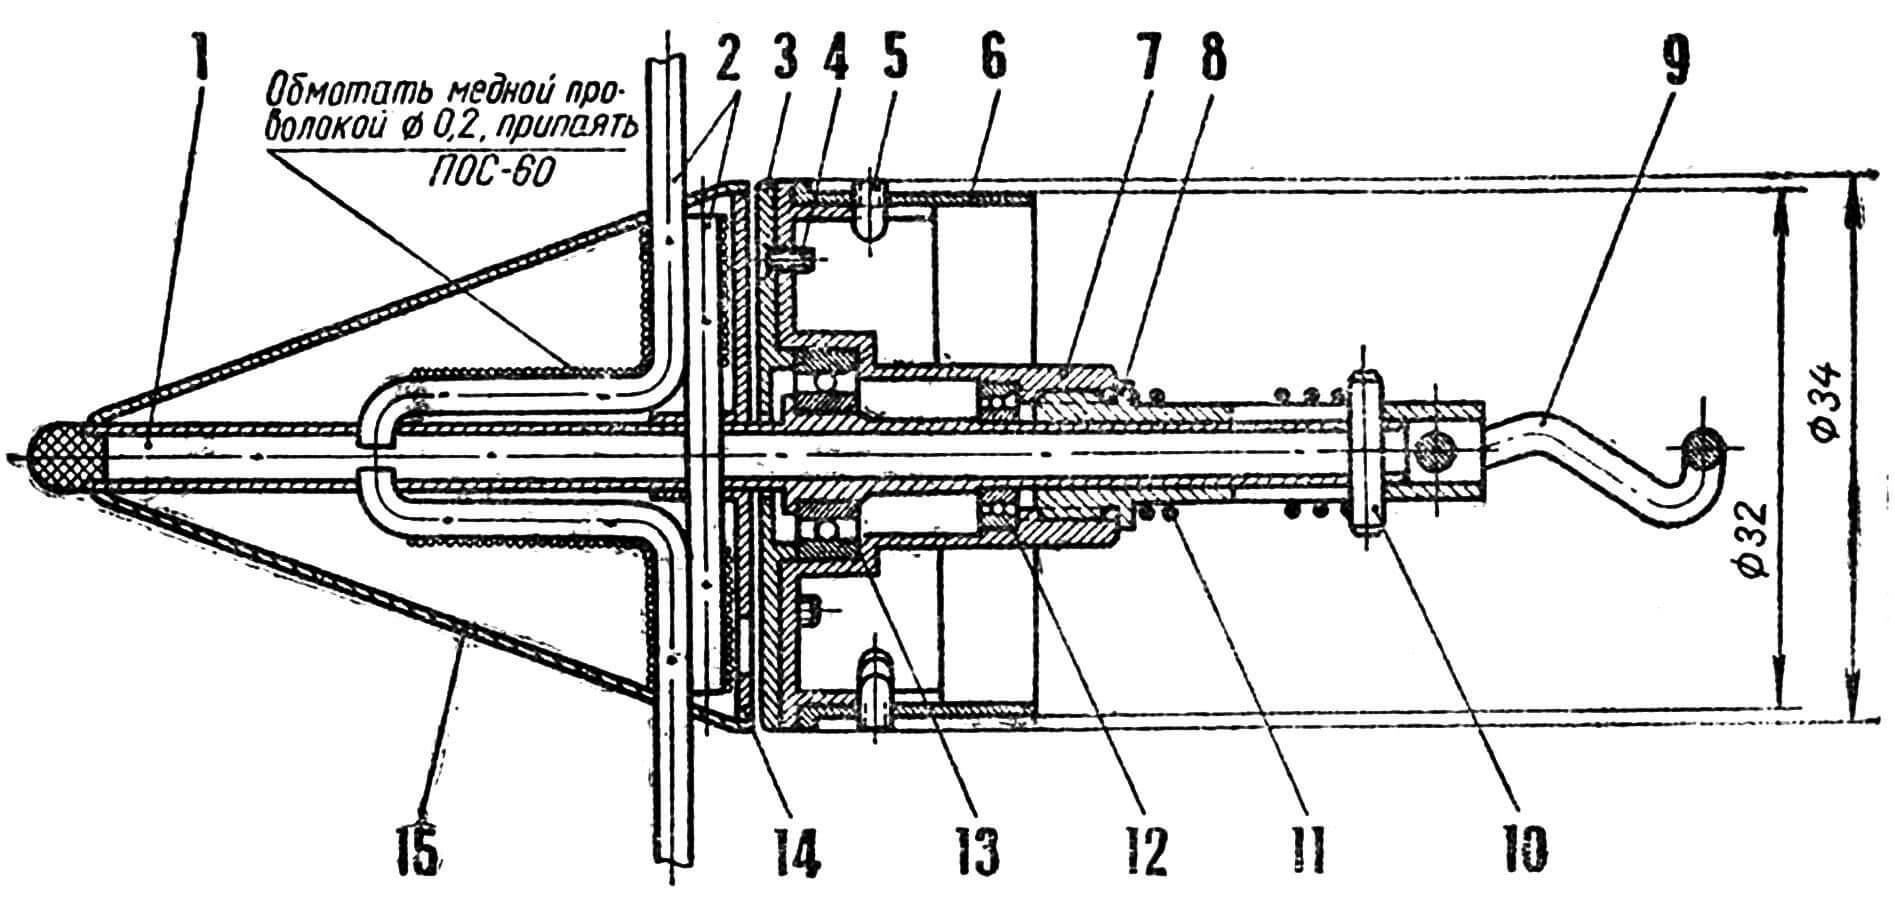 Втулка винта резиномоторной модели: 1 — вал; 2 — ступица (проволока 11А ᴓ 2); 3 — фланец; 4 — винт М1, 4x3 с потайной головкой; 5 — фиксатор; 6 — обойма; 7 — корпус; 8 — стопор; 8 — серьга (проволока 11А ᴓ 2,5); 10 — цилиндрический штифт 2Пх10; 11 — пружина; 12 — шарико¬подшипник 1000084 (ᴓ9x4x25); 13 — шарикоподшипник 1006095 (ᴓ13x5x4); 14 — крышка кока; 15 — кок.